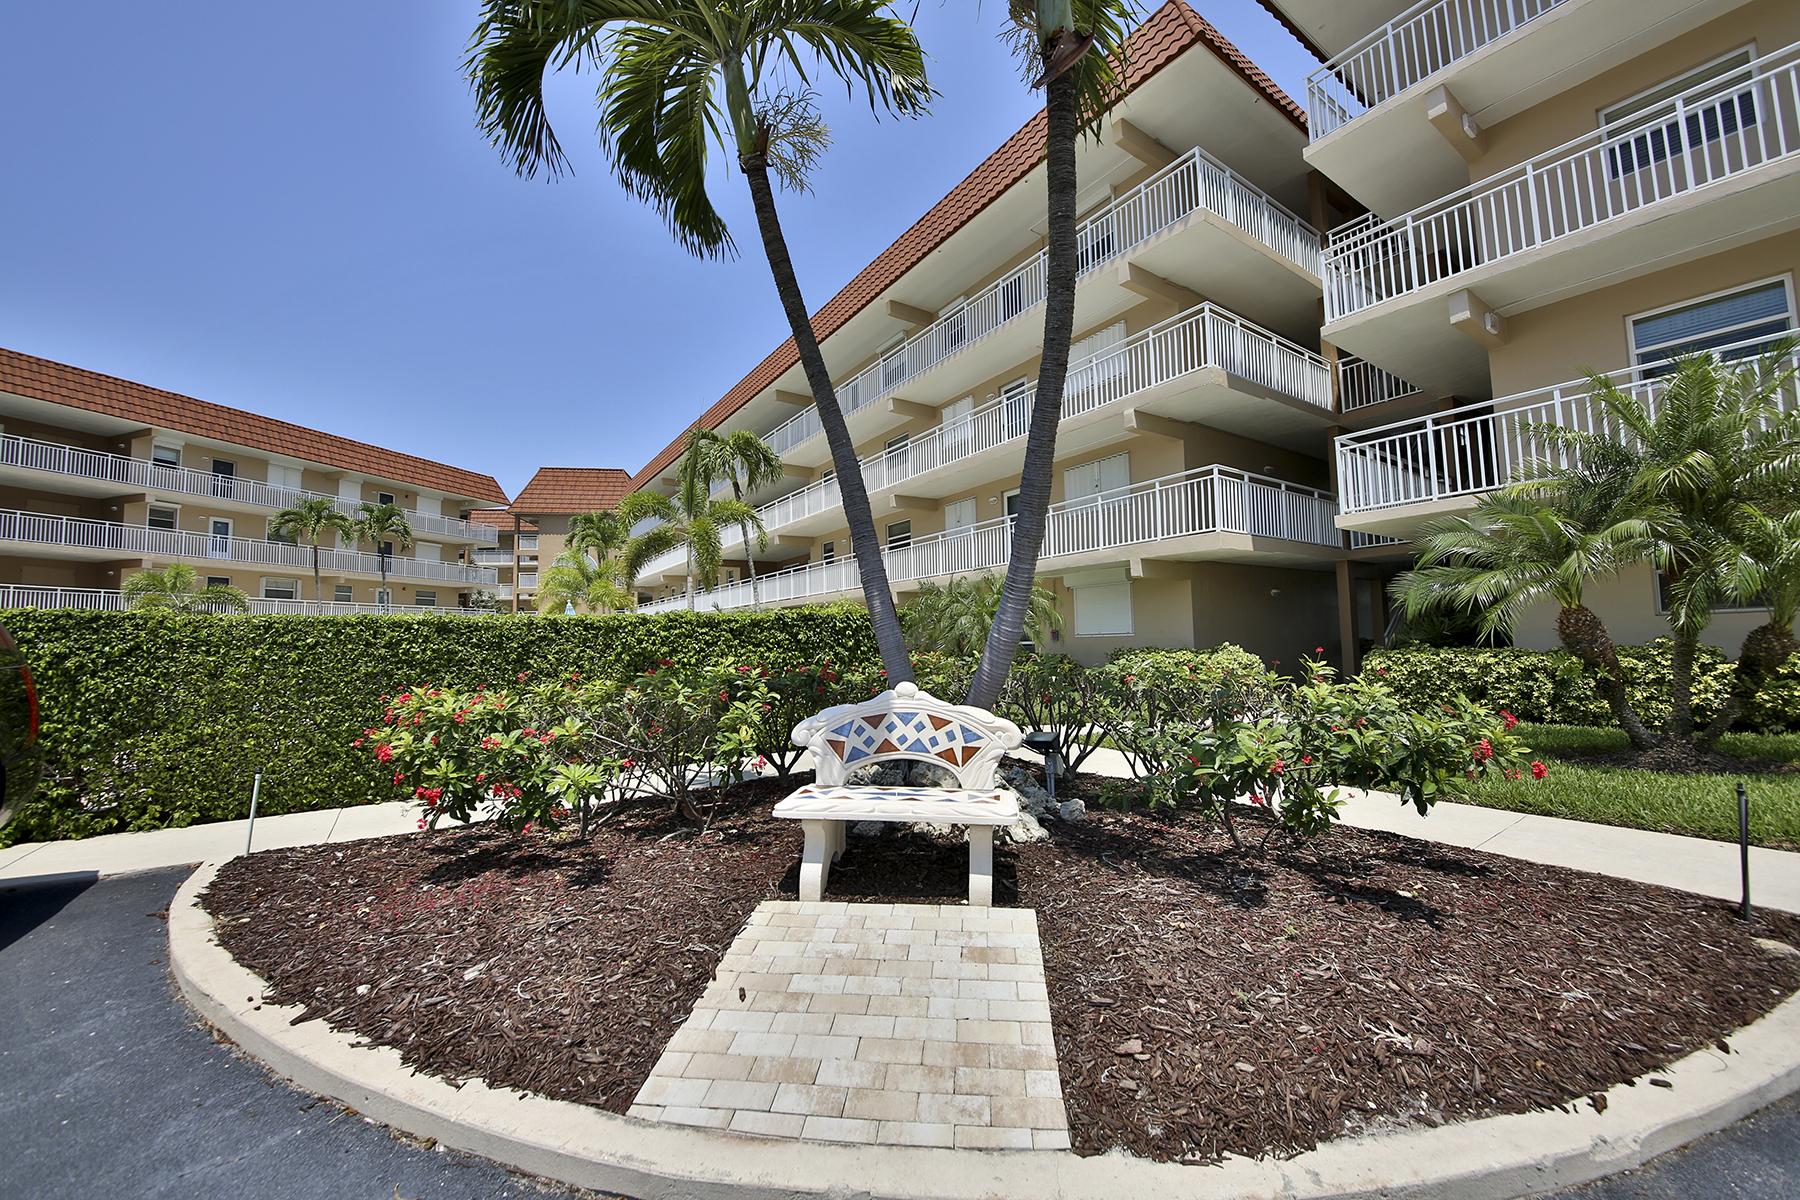 Condominium for Sale at MARCO ISLAND - VILLE DE MARCO WEST 1202 Edington Pl B404 Marco Island, Florida 34145 United States